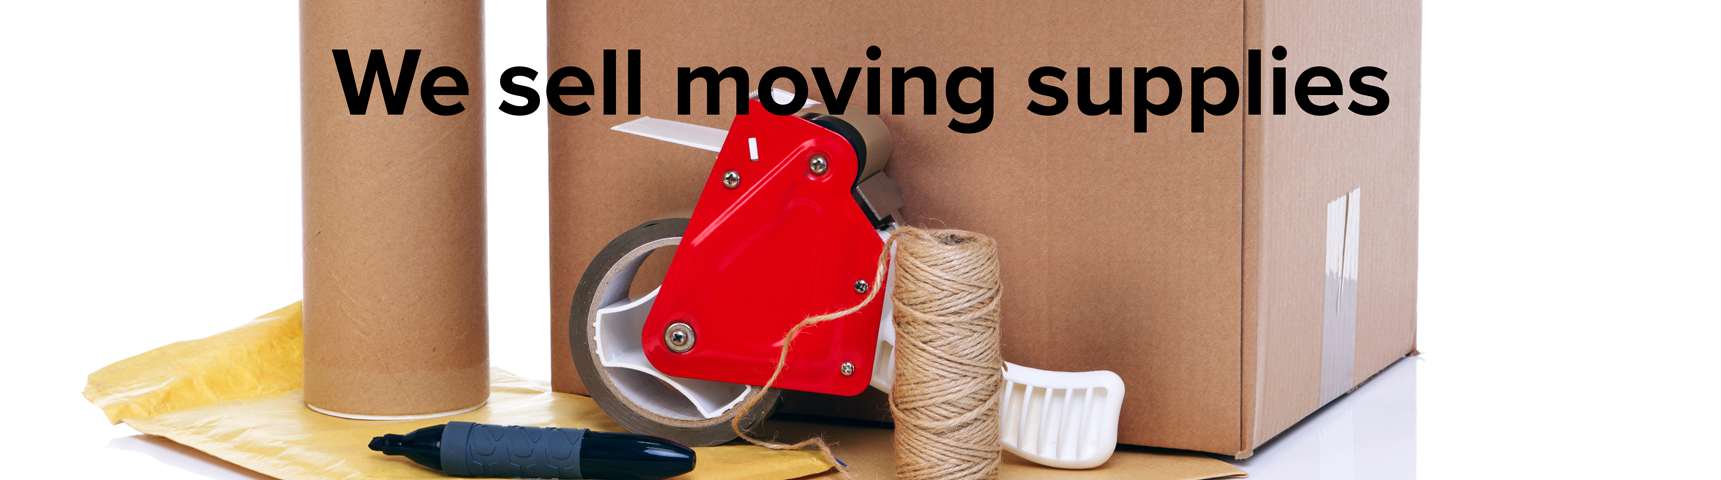 We sell moving supplies near Peekskill, NY